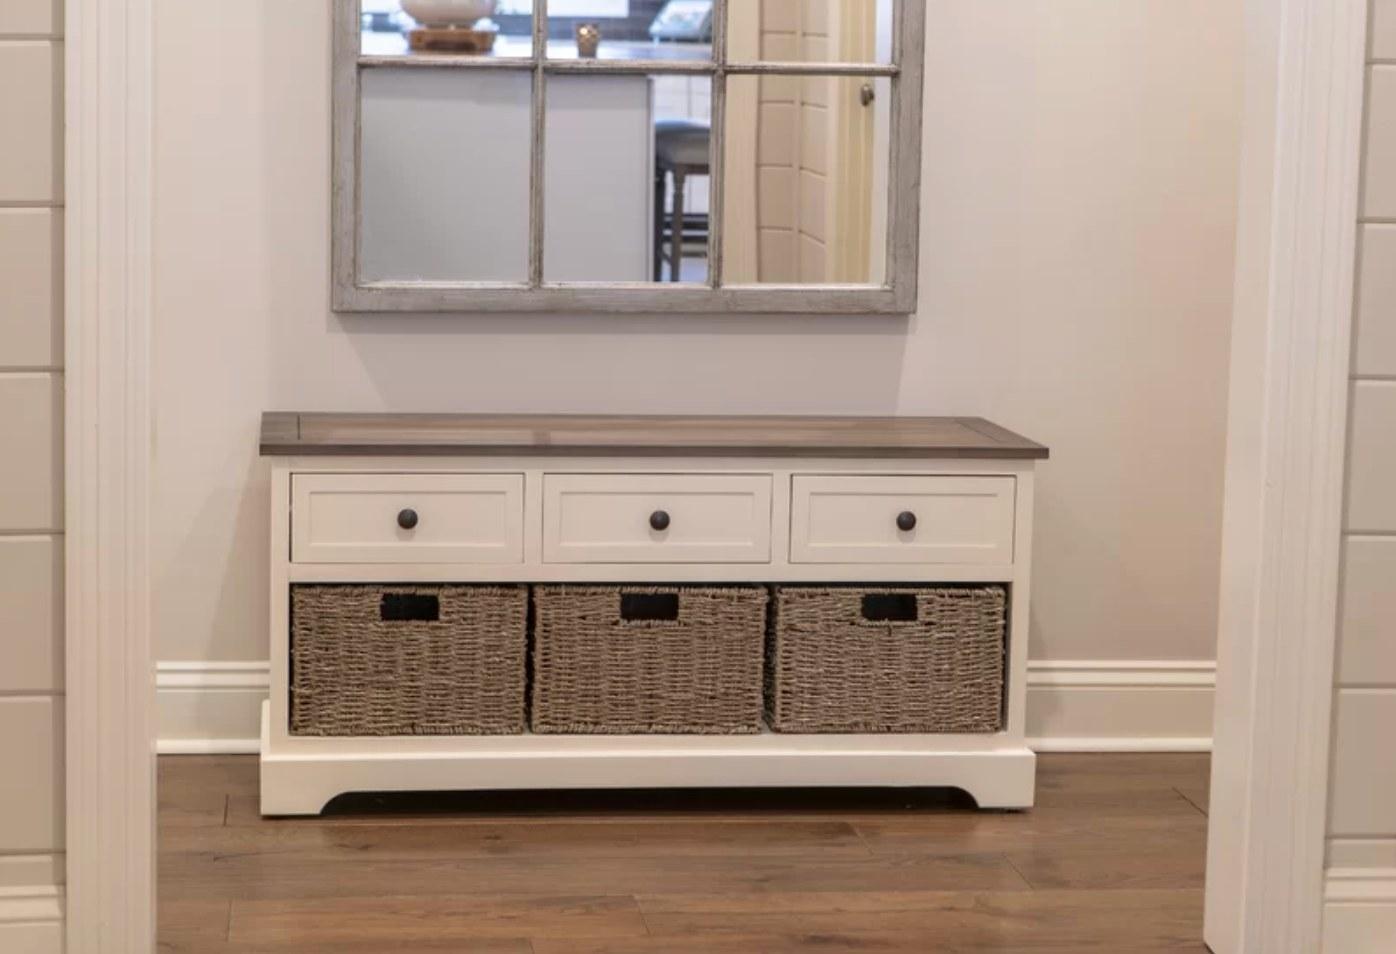 The storage bench in white